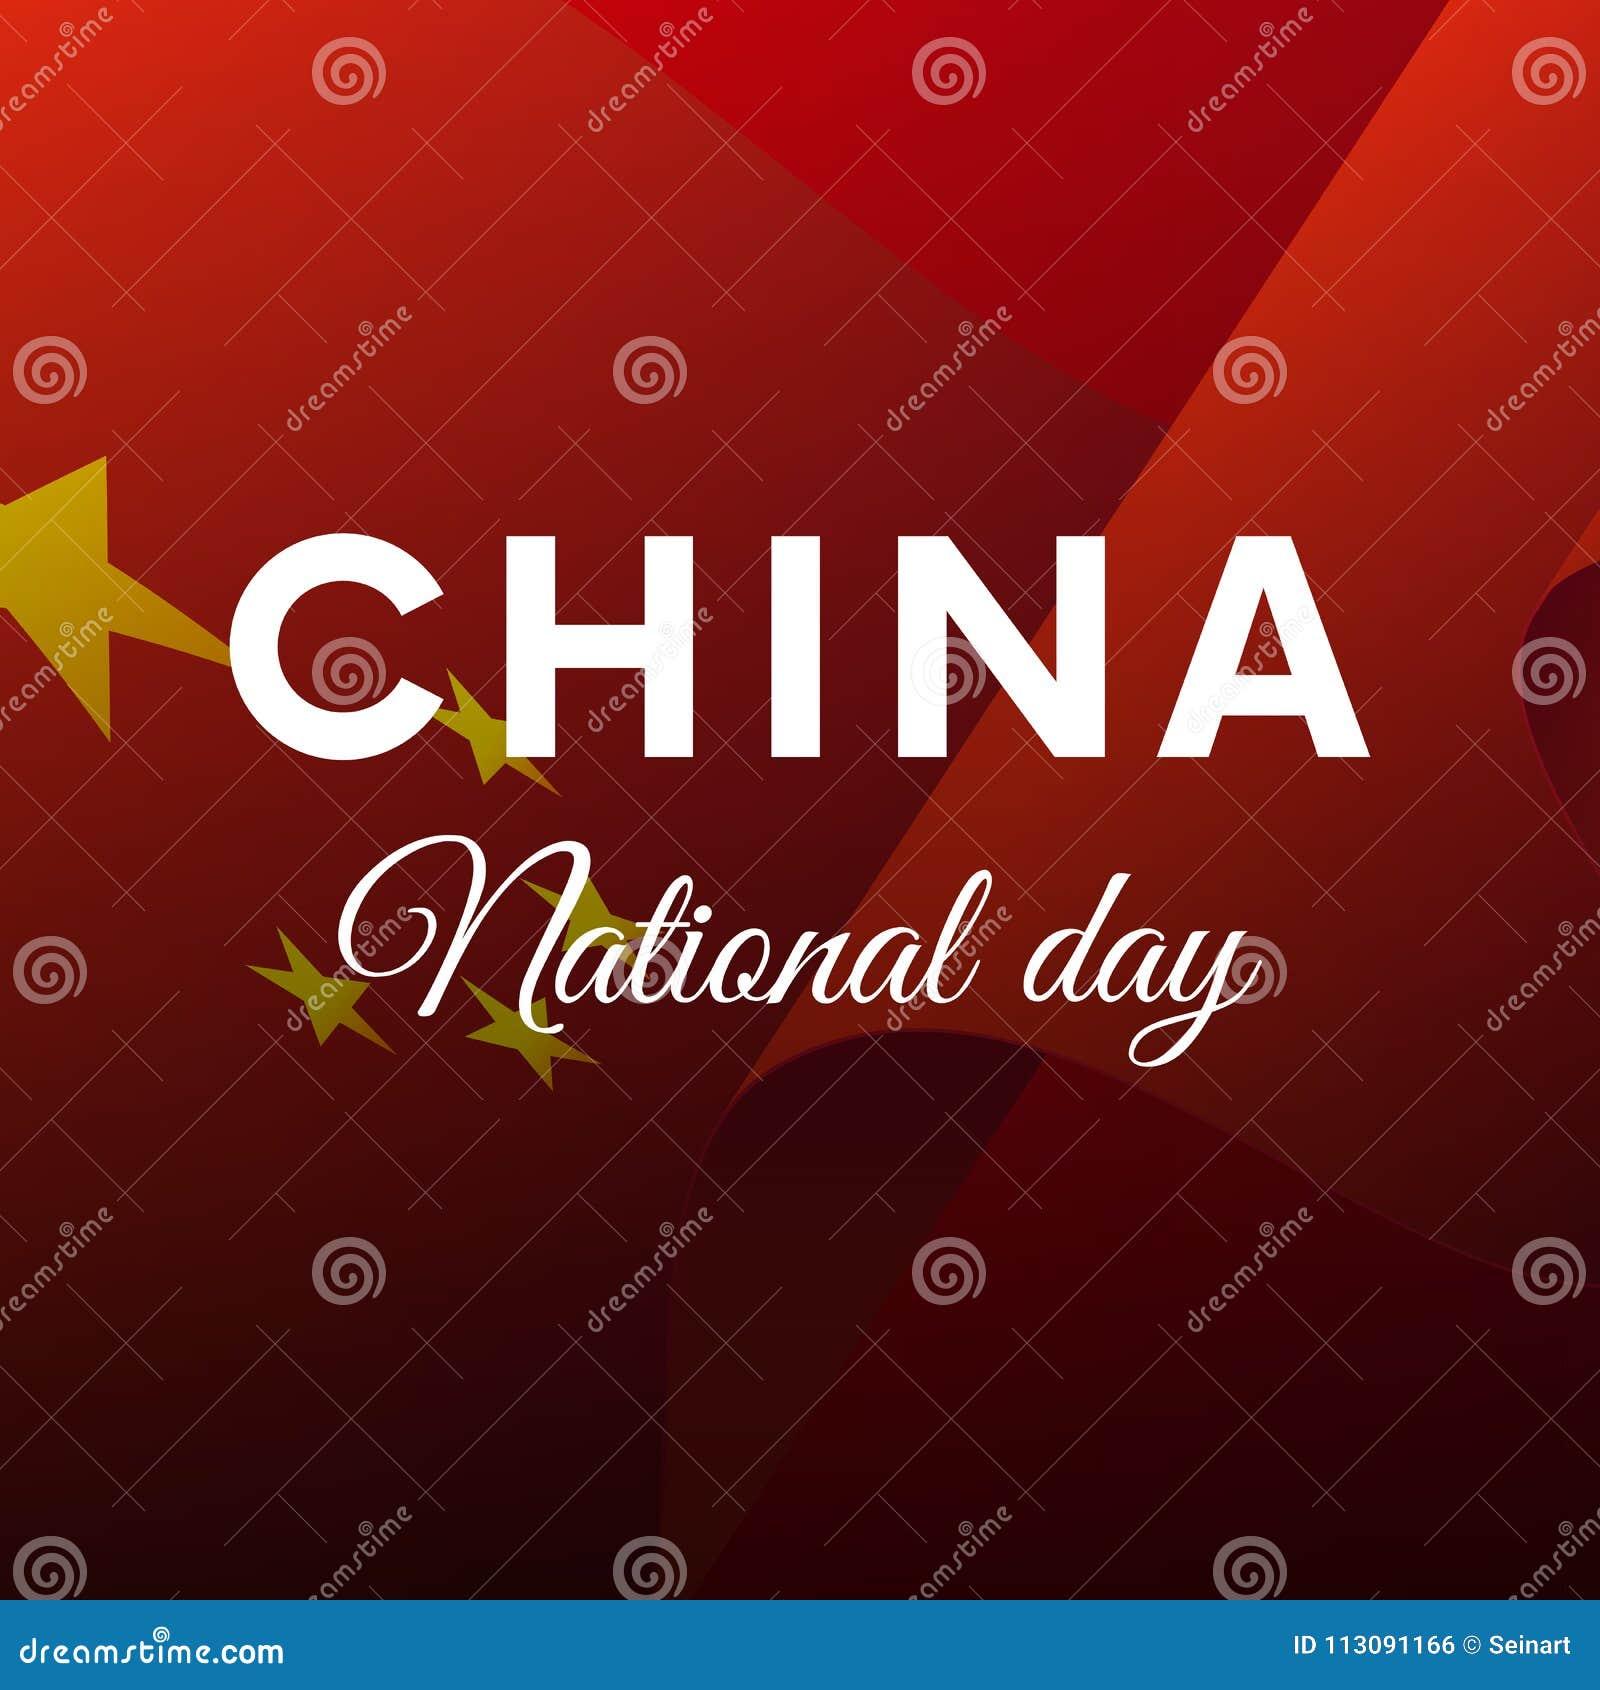 China National day. Vector illustration.